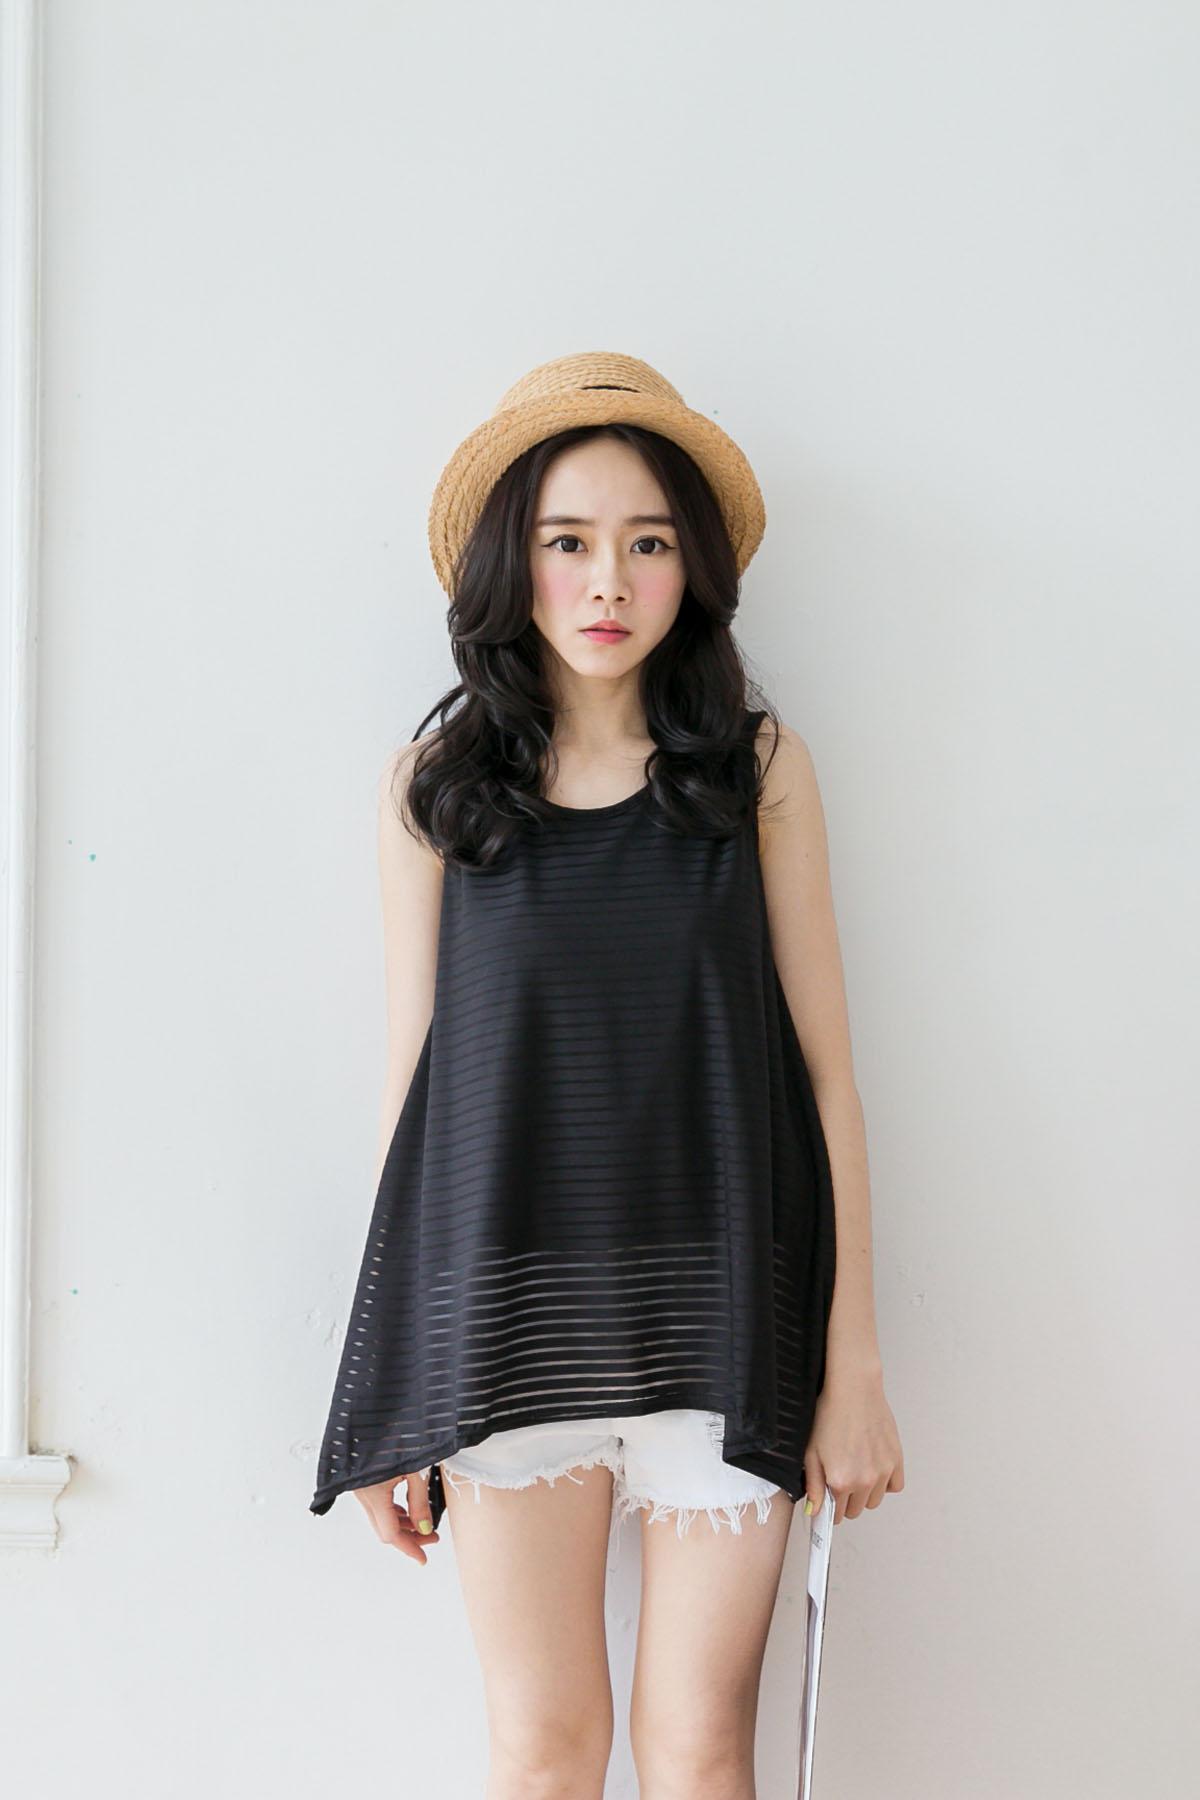 TOKYO FASHION Womens Striped Sheer Sleeveless Long Top Japanese/Korean Fashion